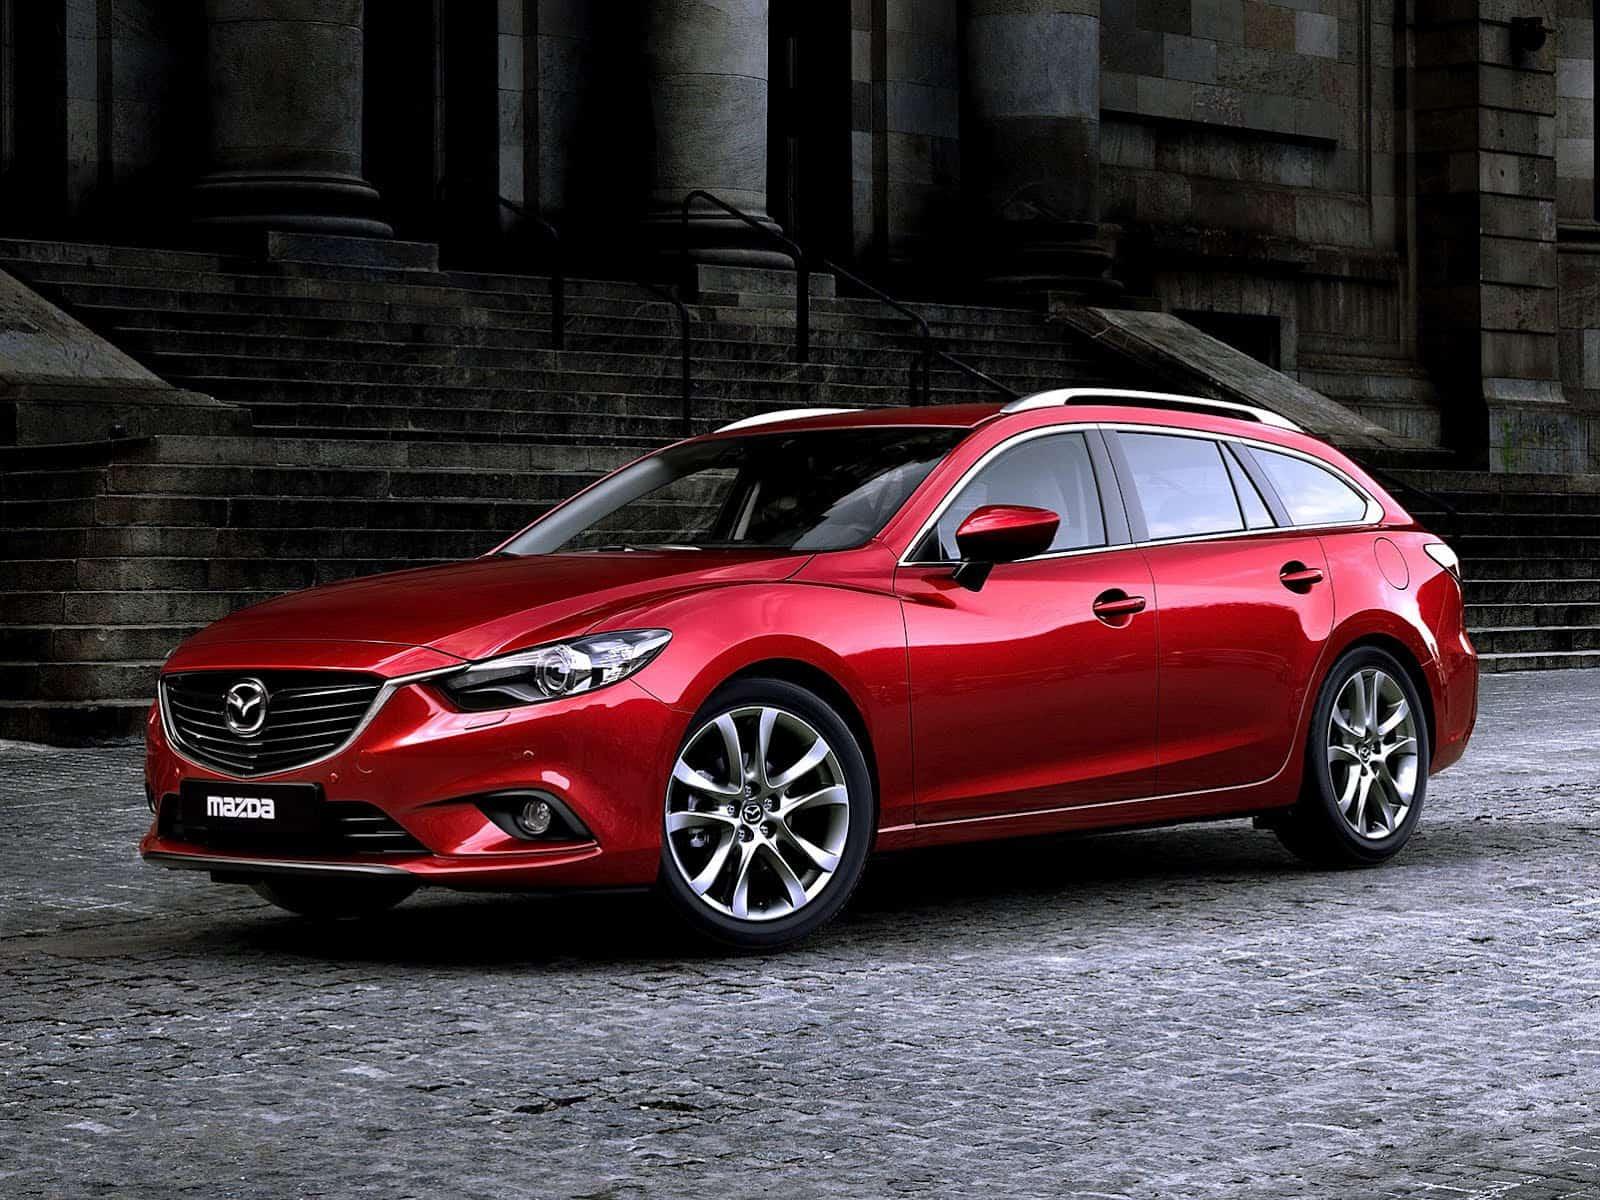 Mazda6 – reliable car